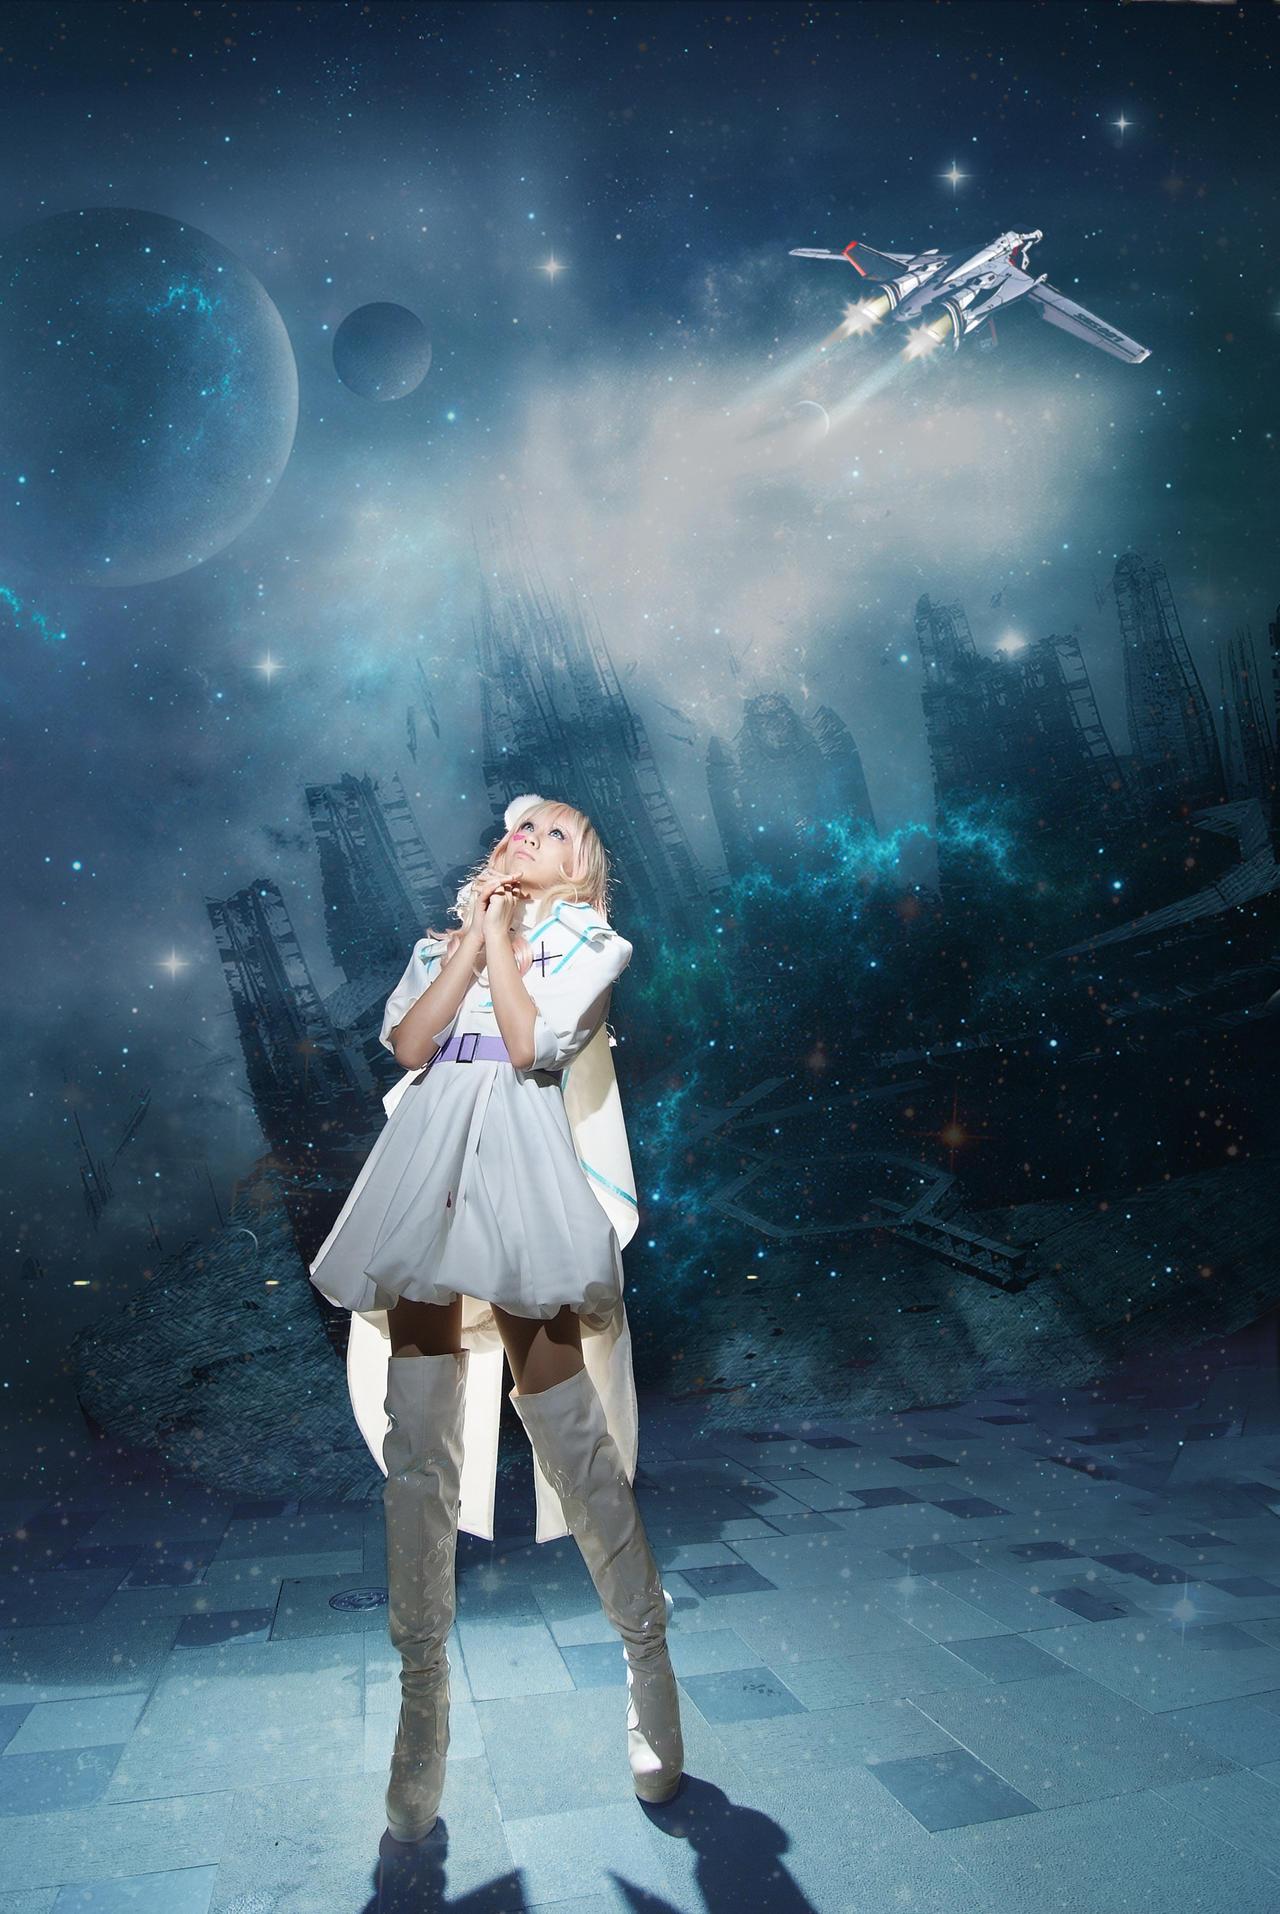 [Macross Frontier] White Bunny by yamihoshi123